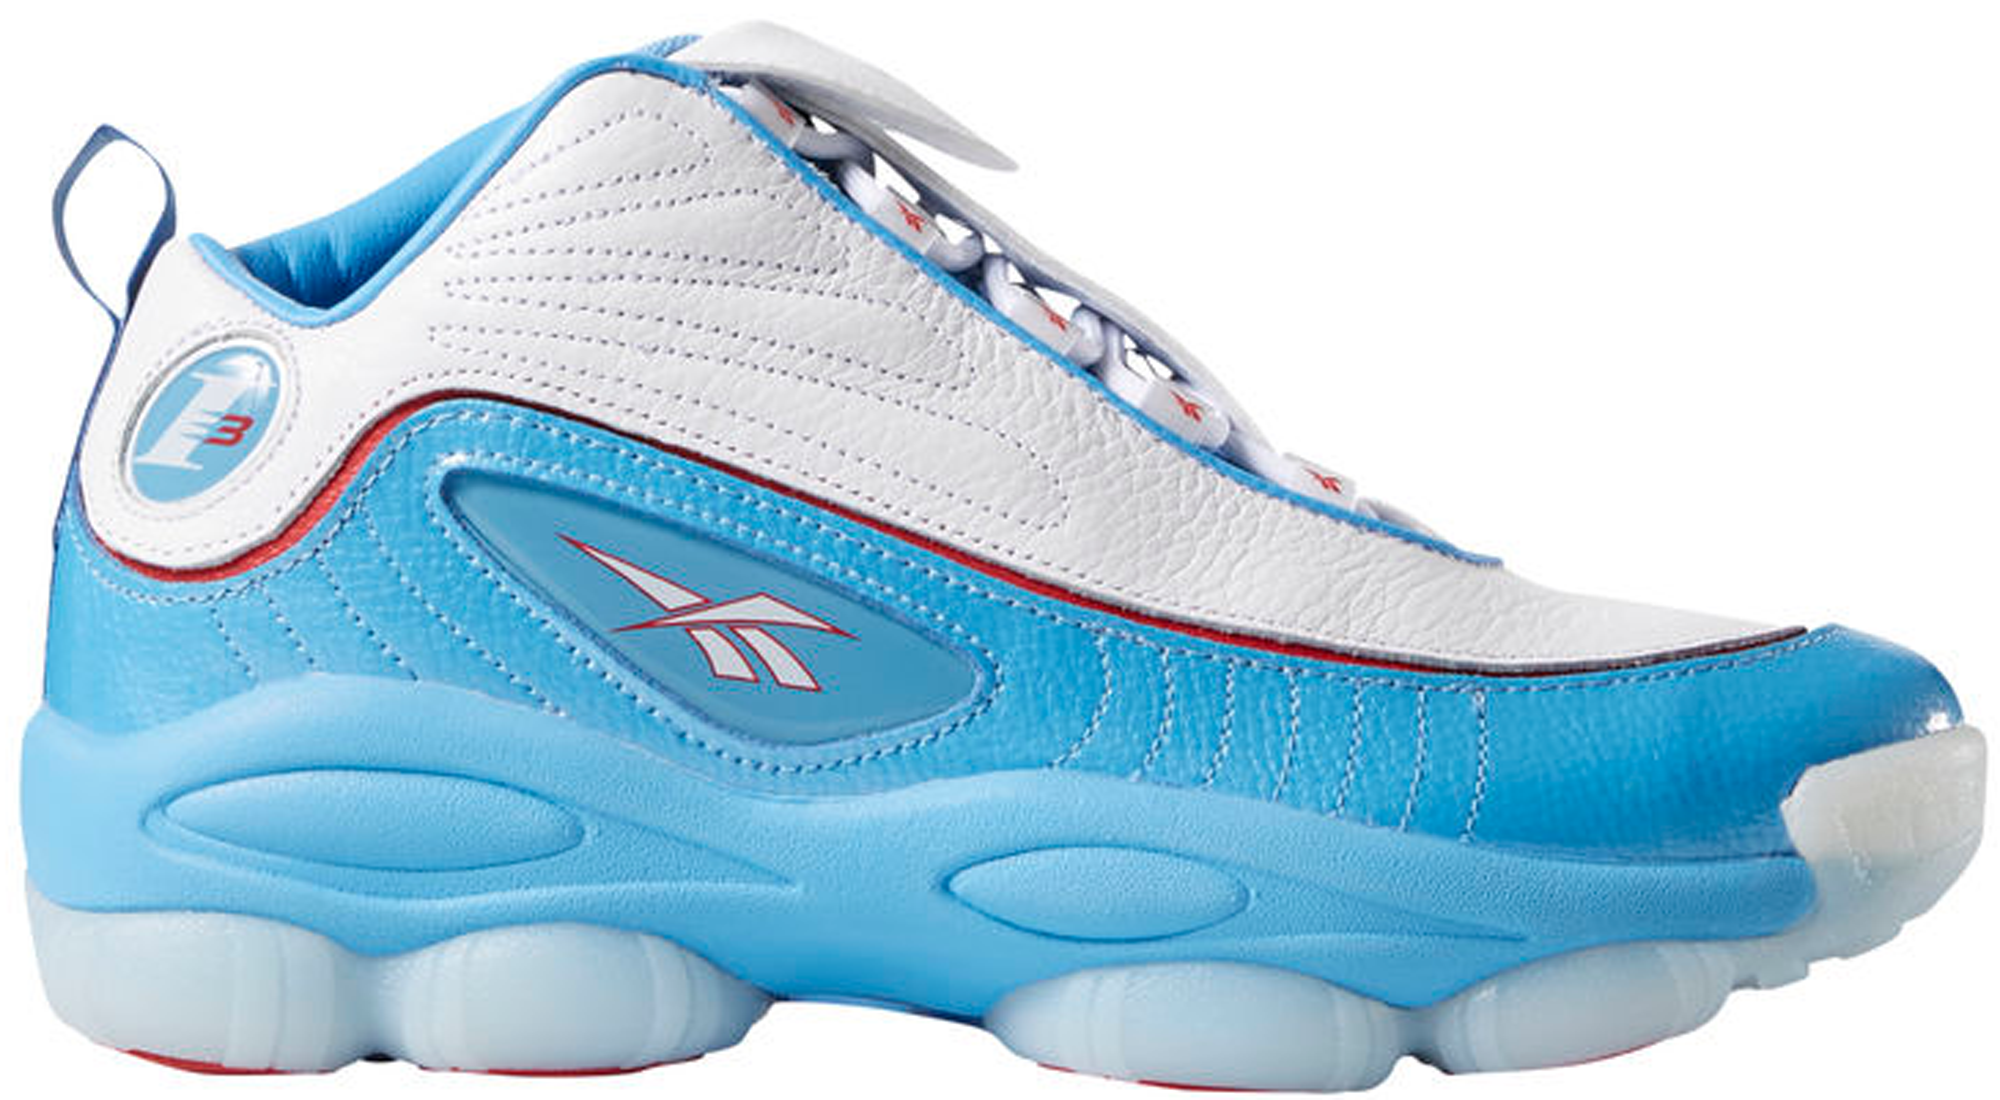 Reebok Iverson Legacy Athletic Blue